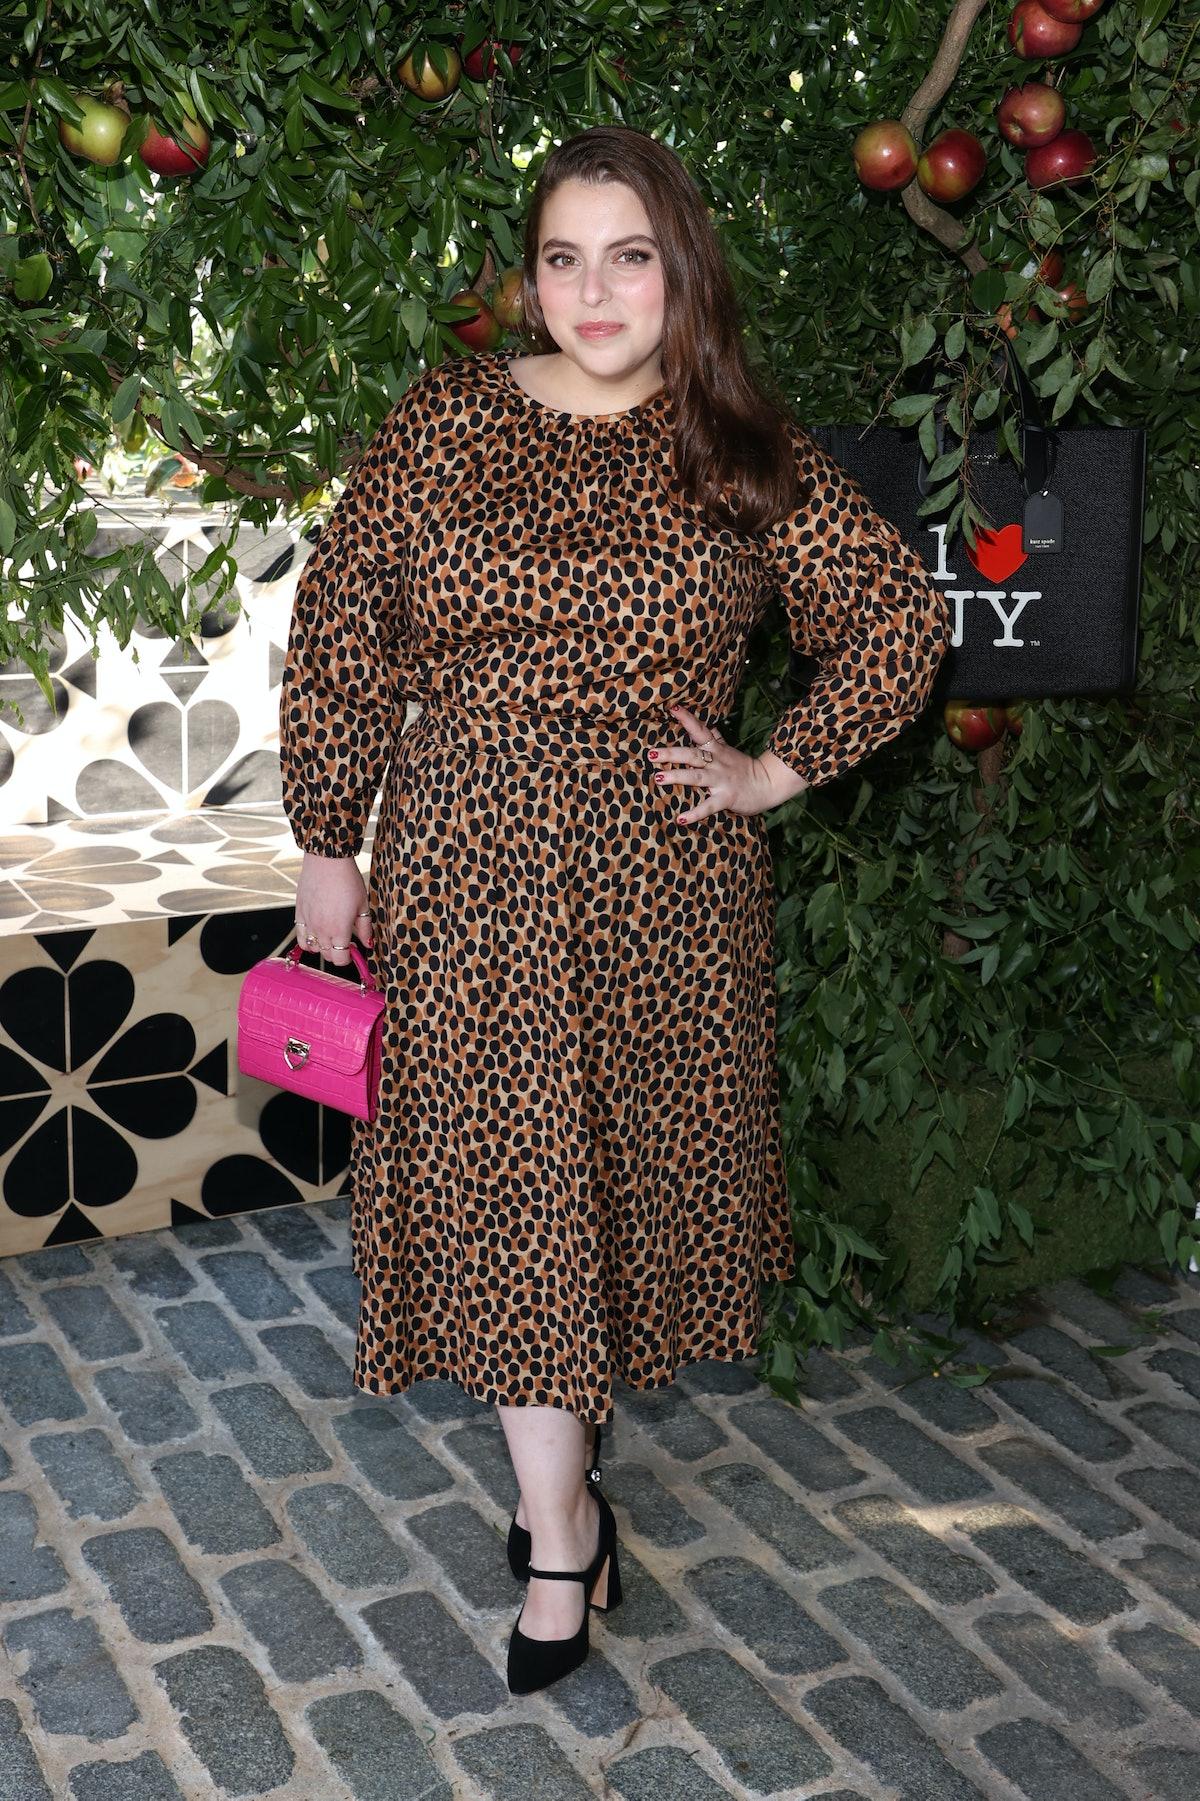 Beanie Feldstein در طول مهمانی افتتاحیه VIP Kate Spade New York Popup Installation for NYF دیده می شود ...